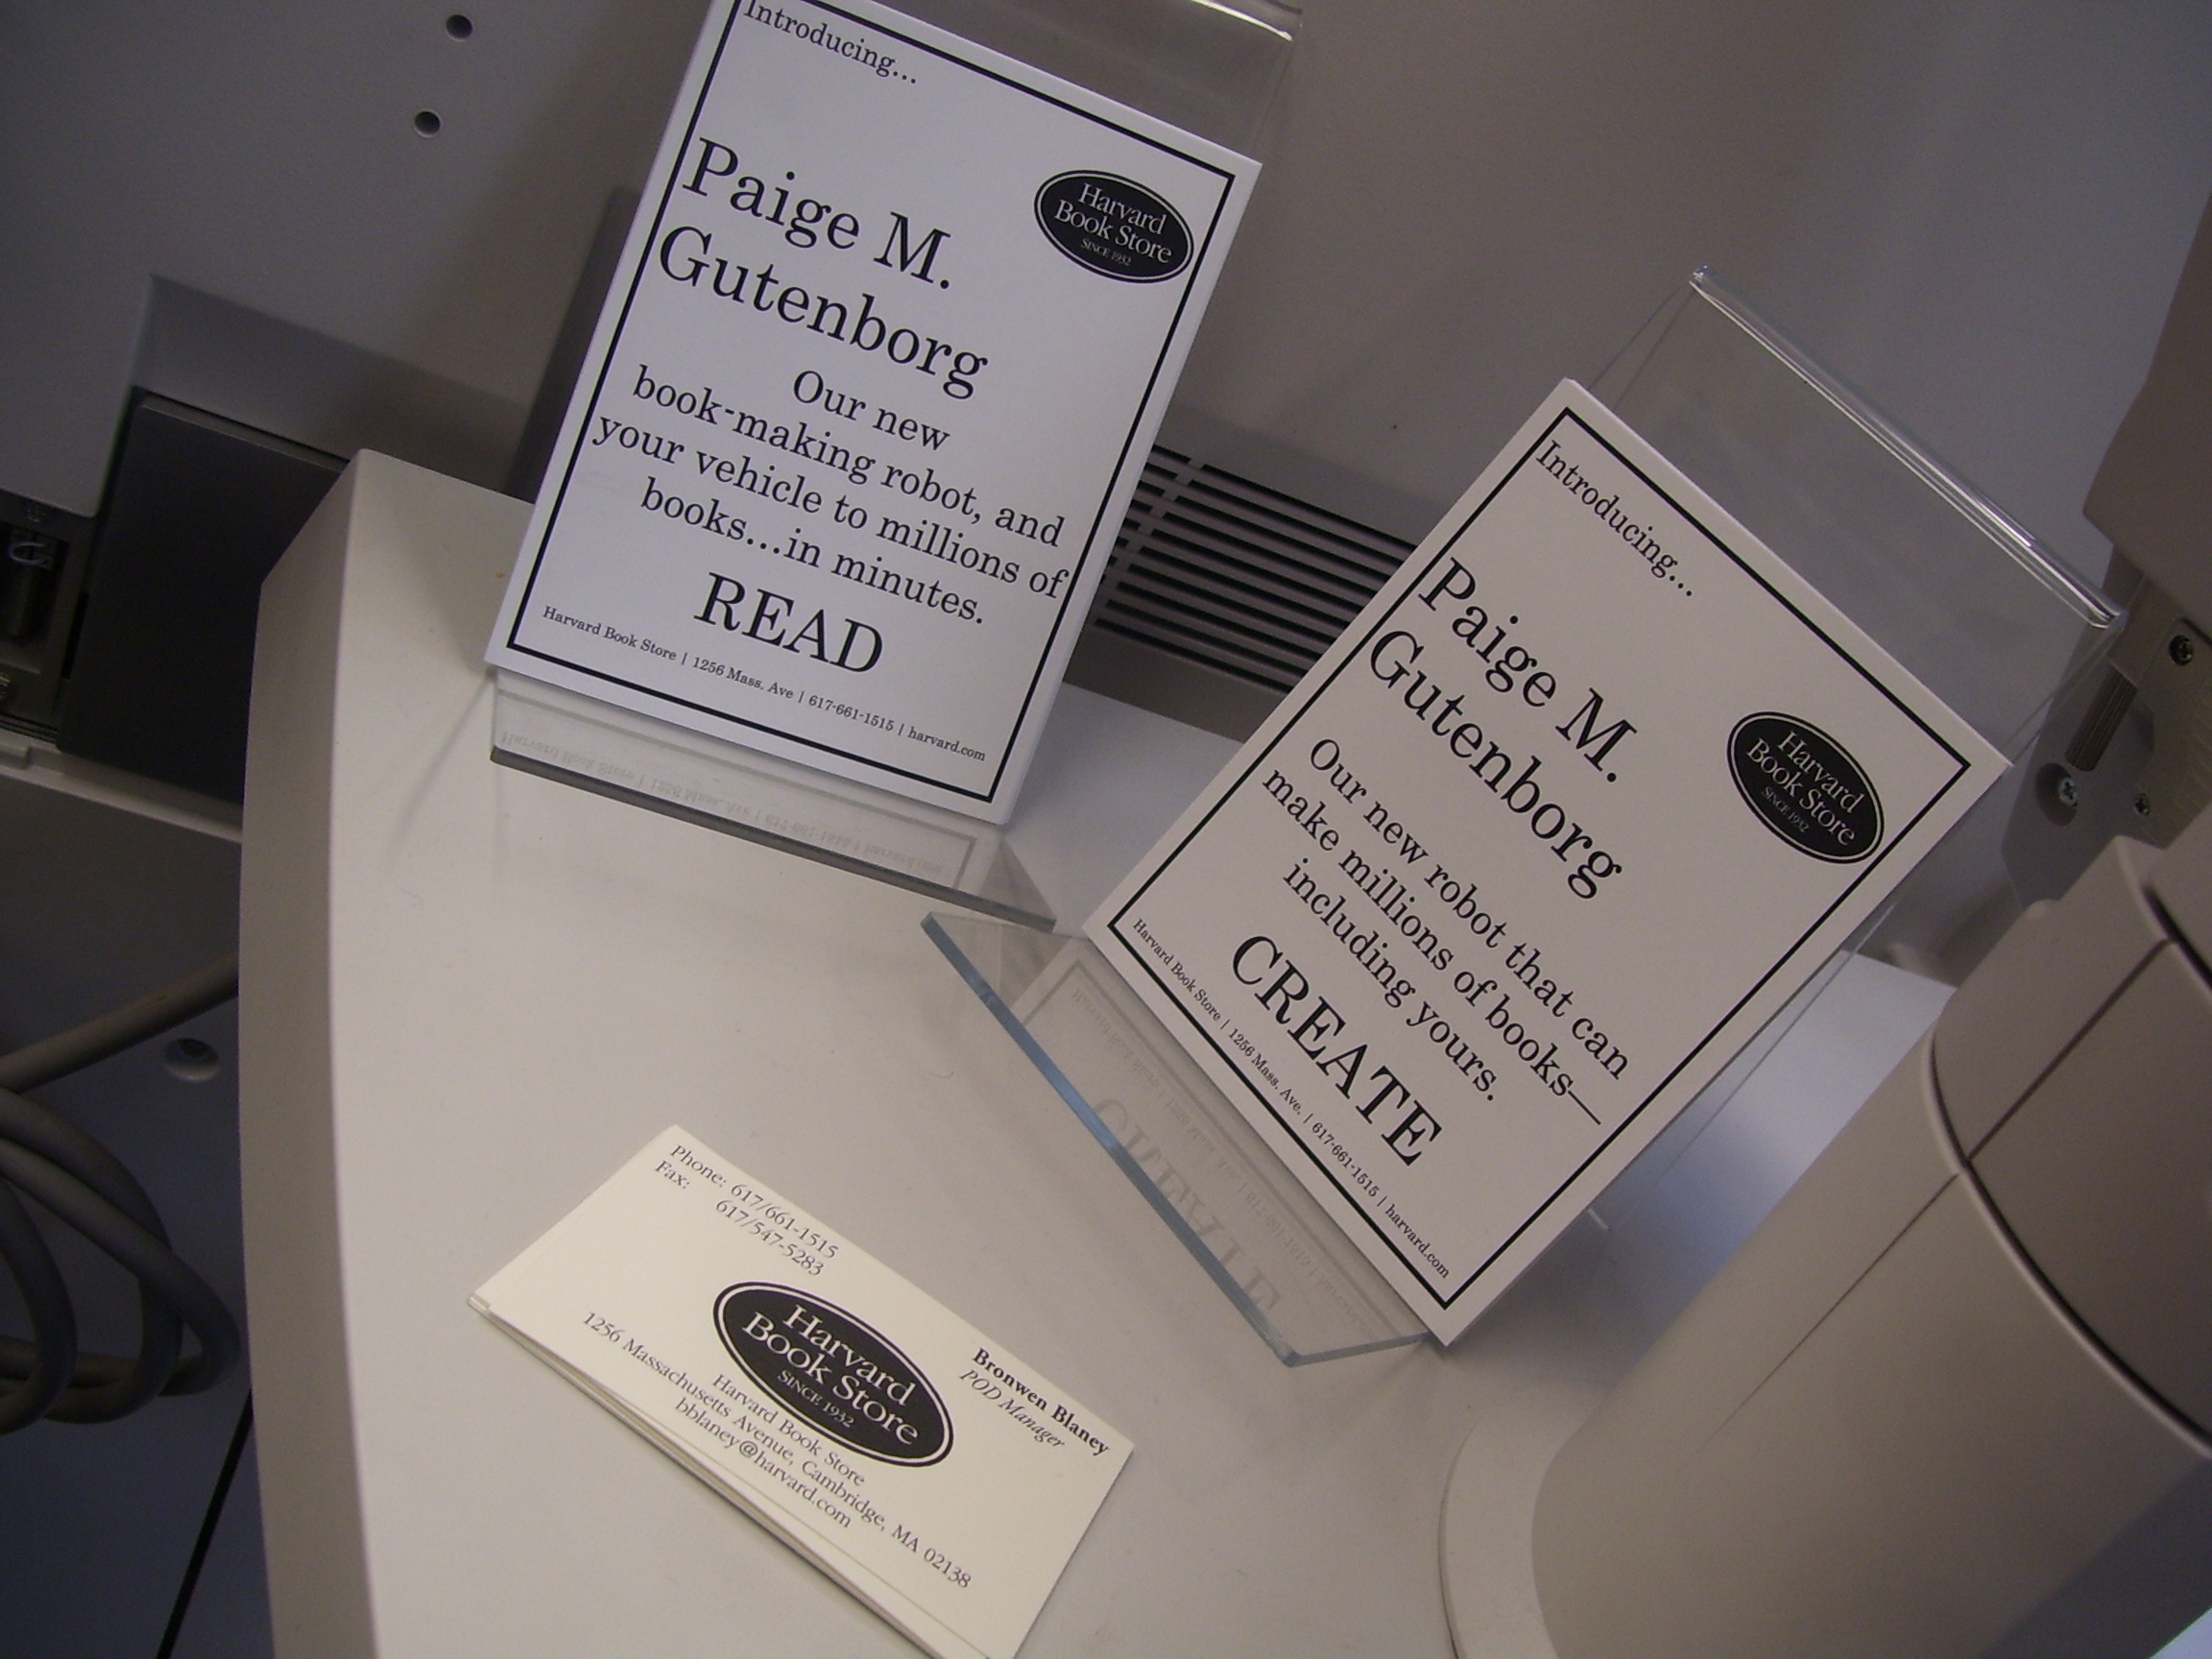 paige_m_gutenborg_placards